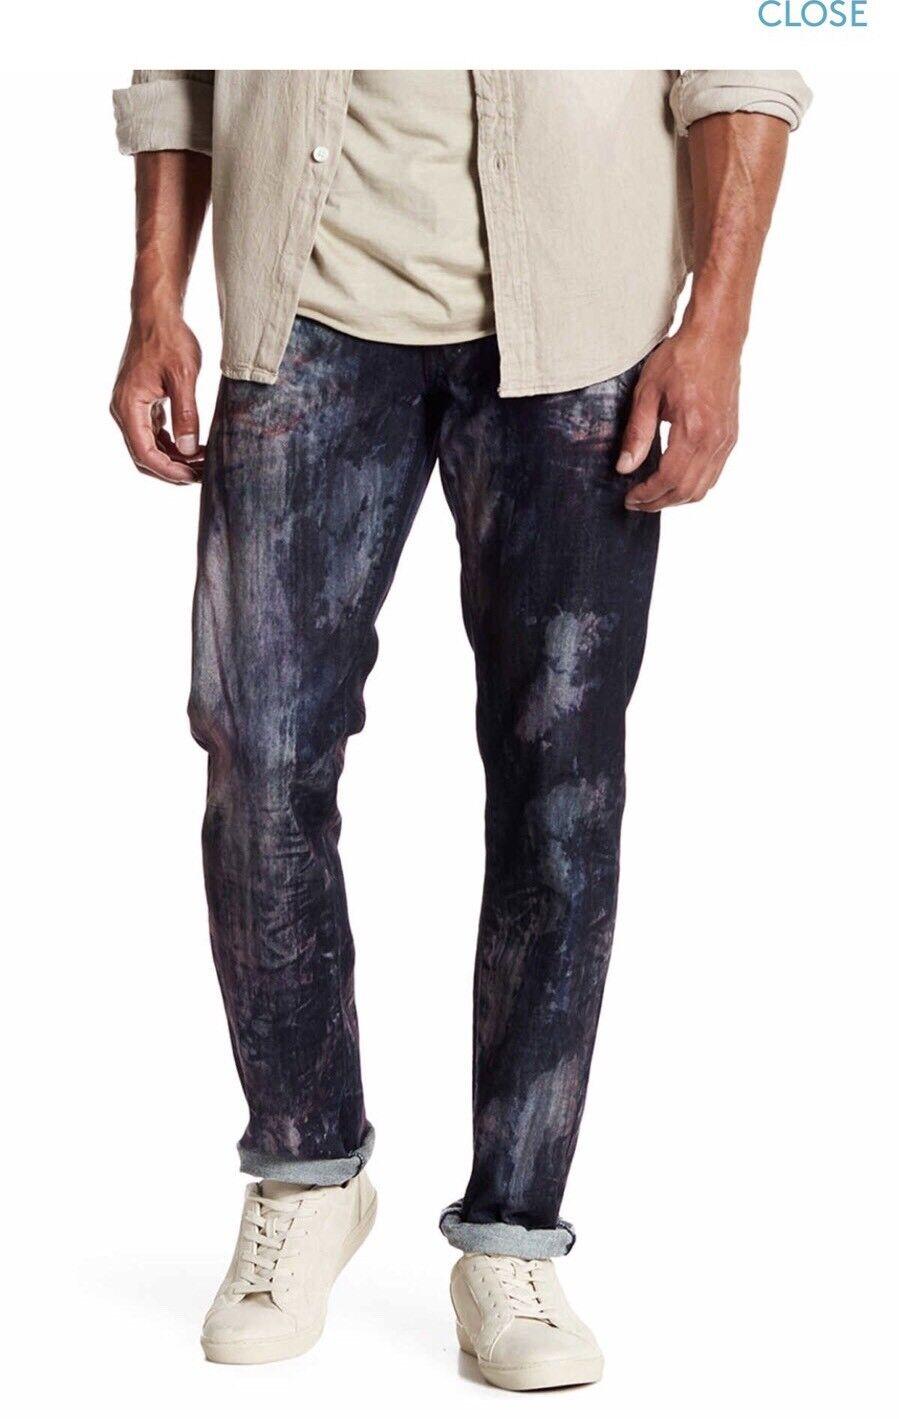 NEW Prps  Barracuda Regular Fit Denim Jeans Indigo Size 34